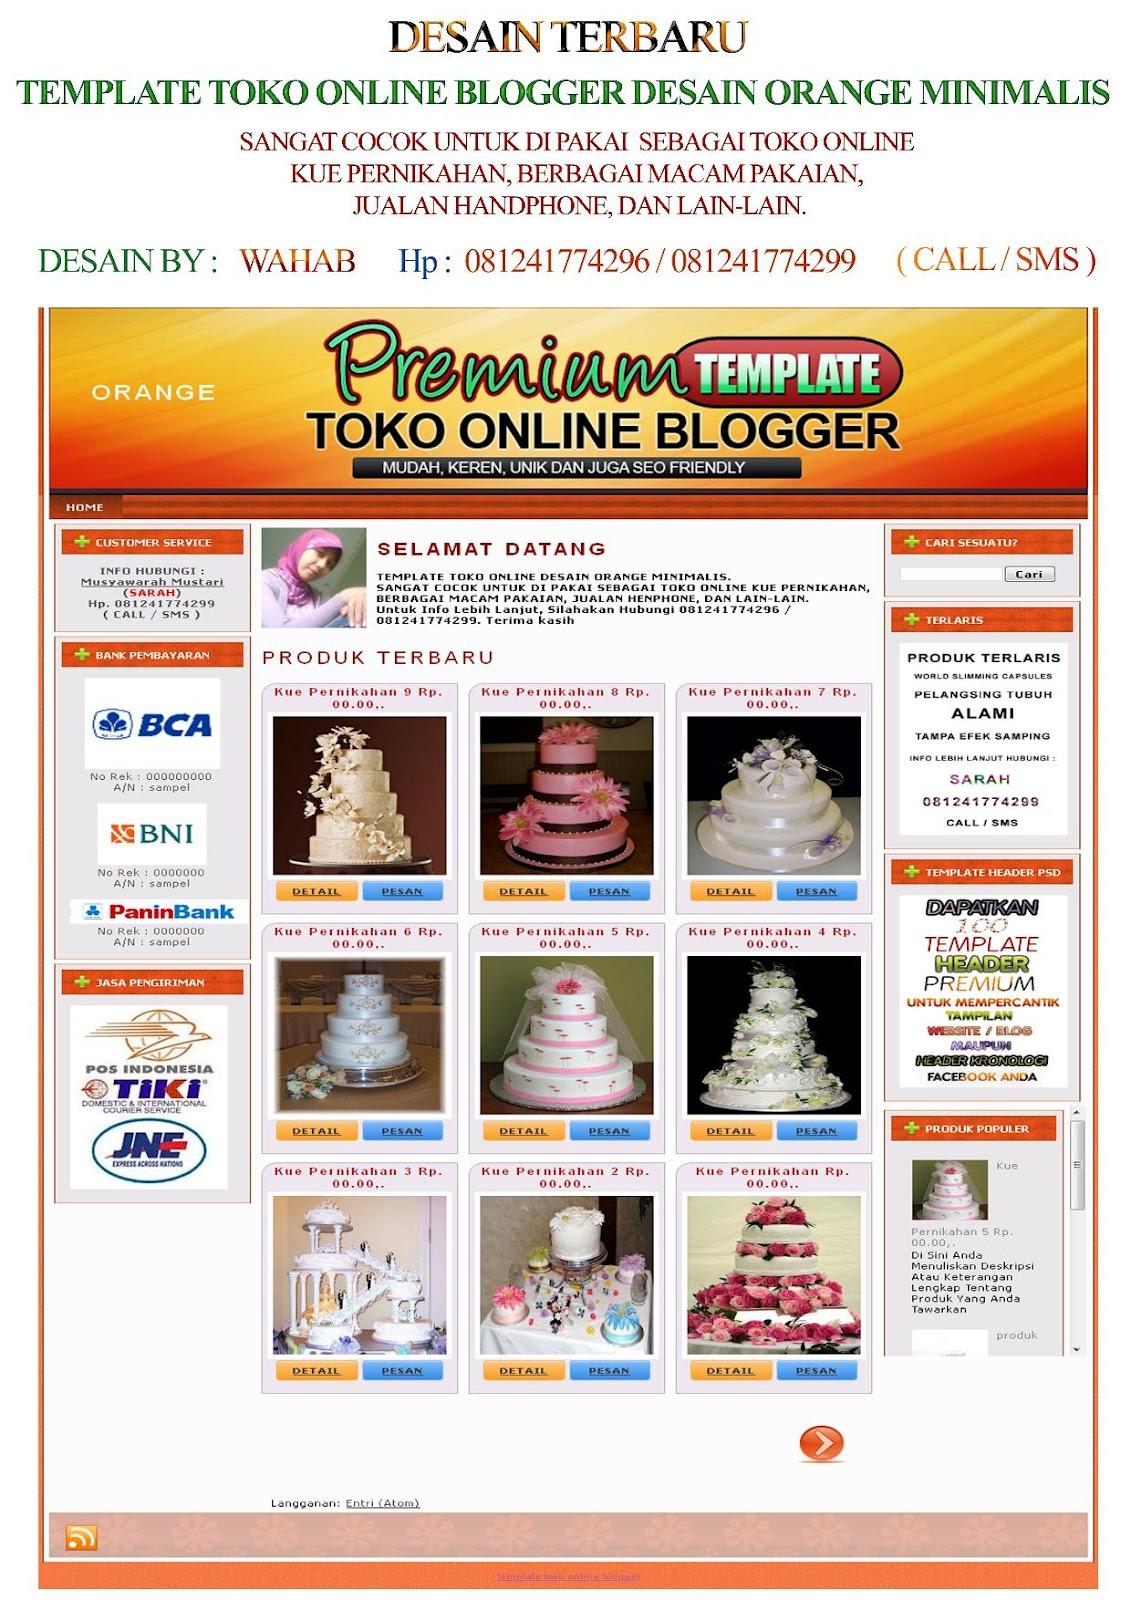 Toko Online Blogger